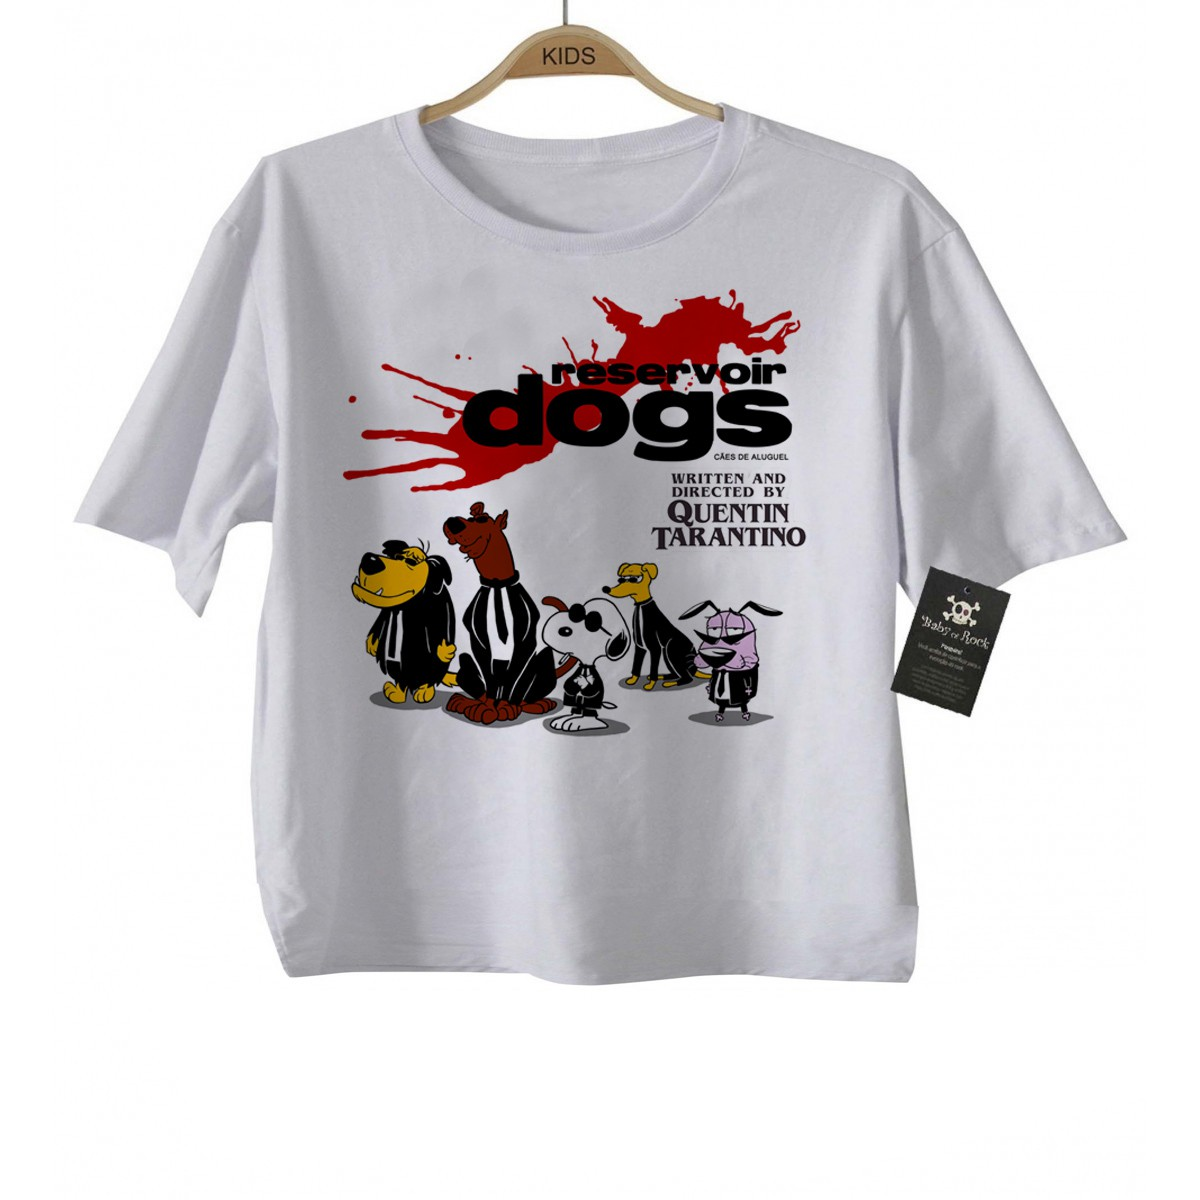 Camiseta Infantil filmes Cães de Aluguel (Tarantino) - White  - Baby Monster S/A